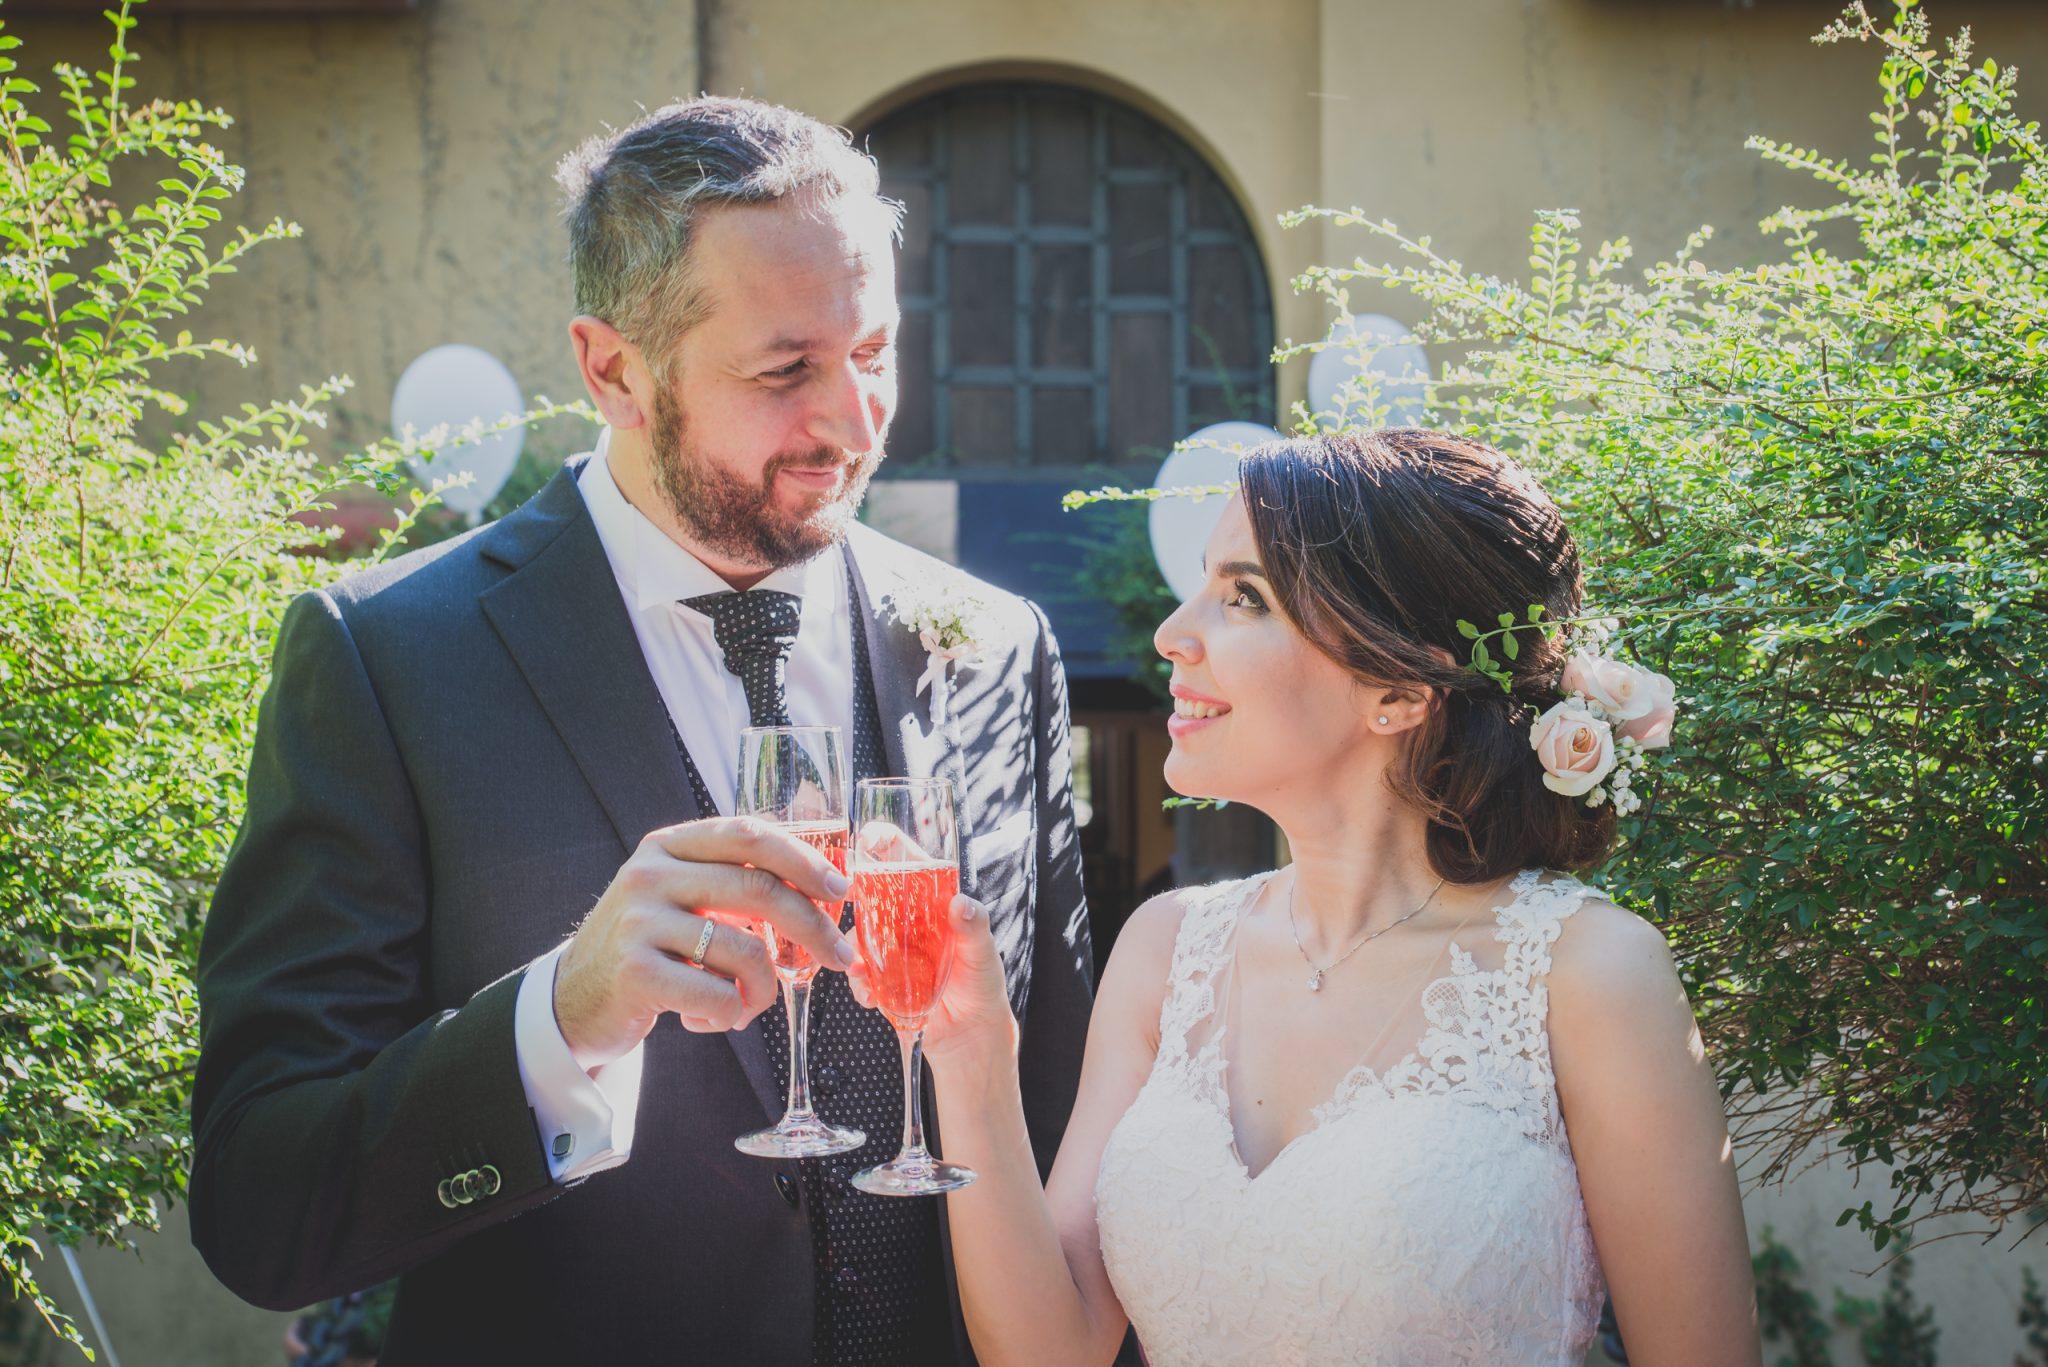 Brindisi sposi con spritz